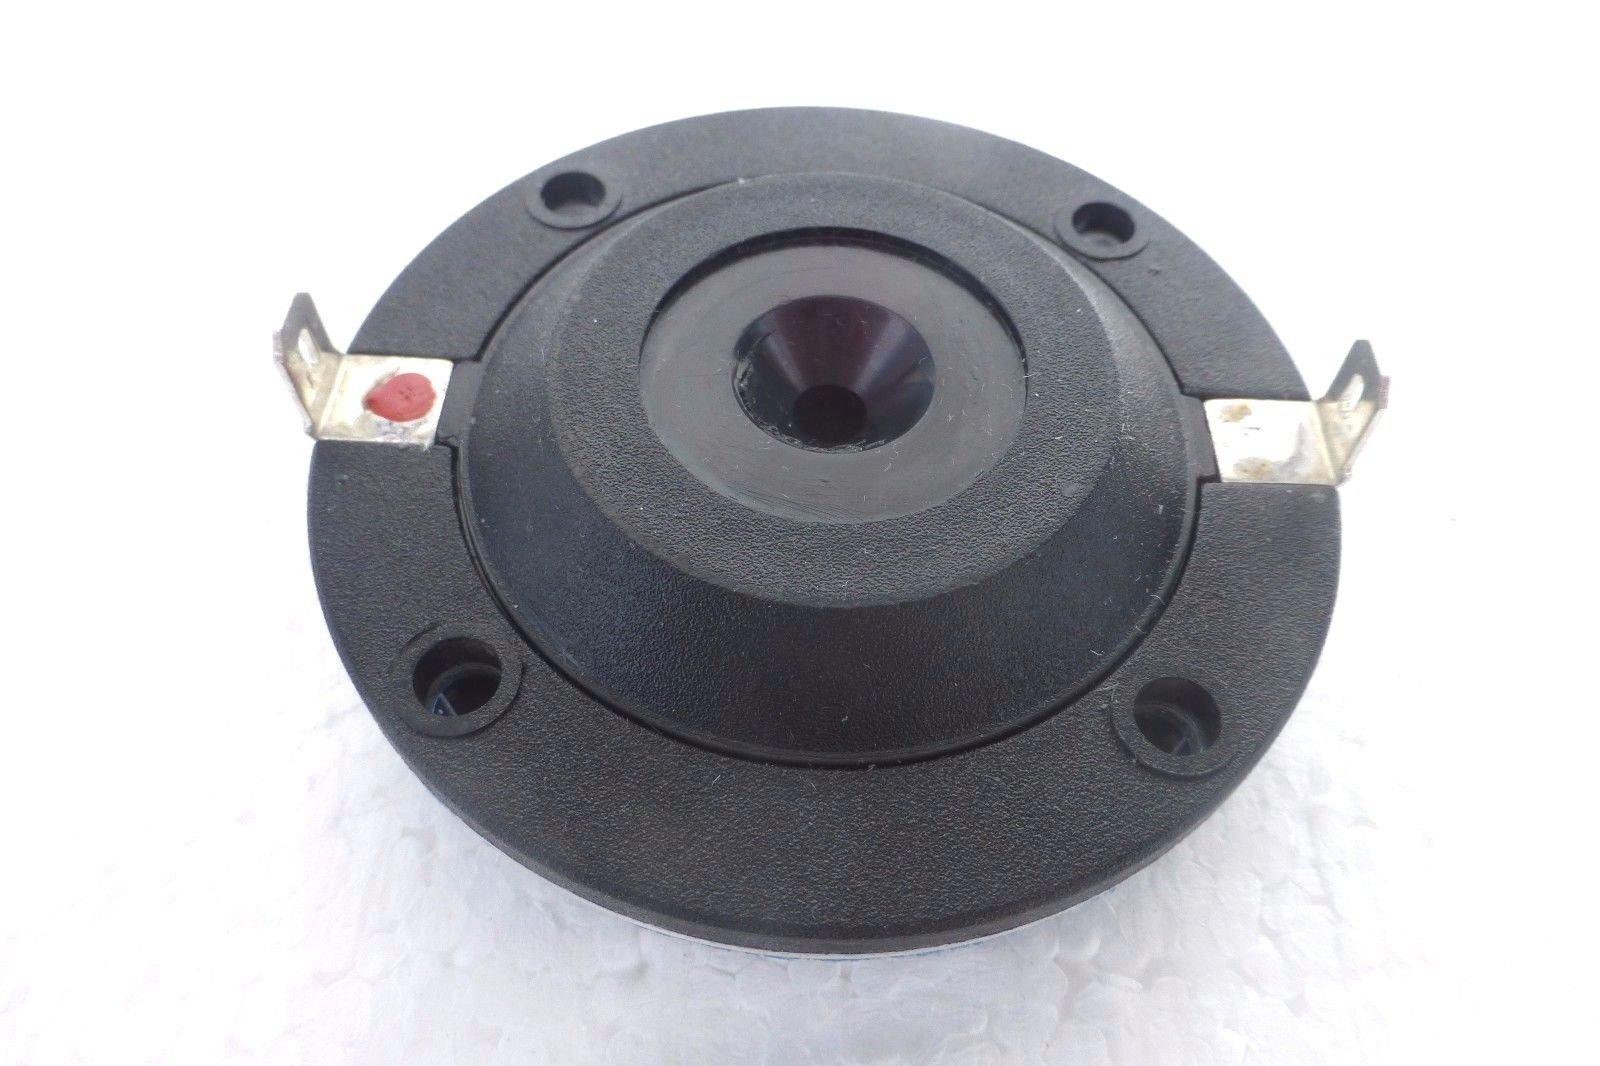 Replacement For Yorkville NX750P Diaphragm BMS-4538 Driver Elite E12, E15, E210B